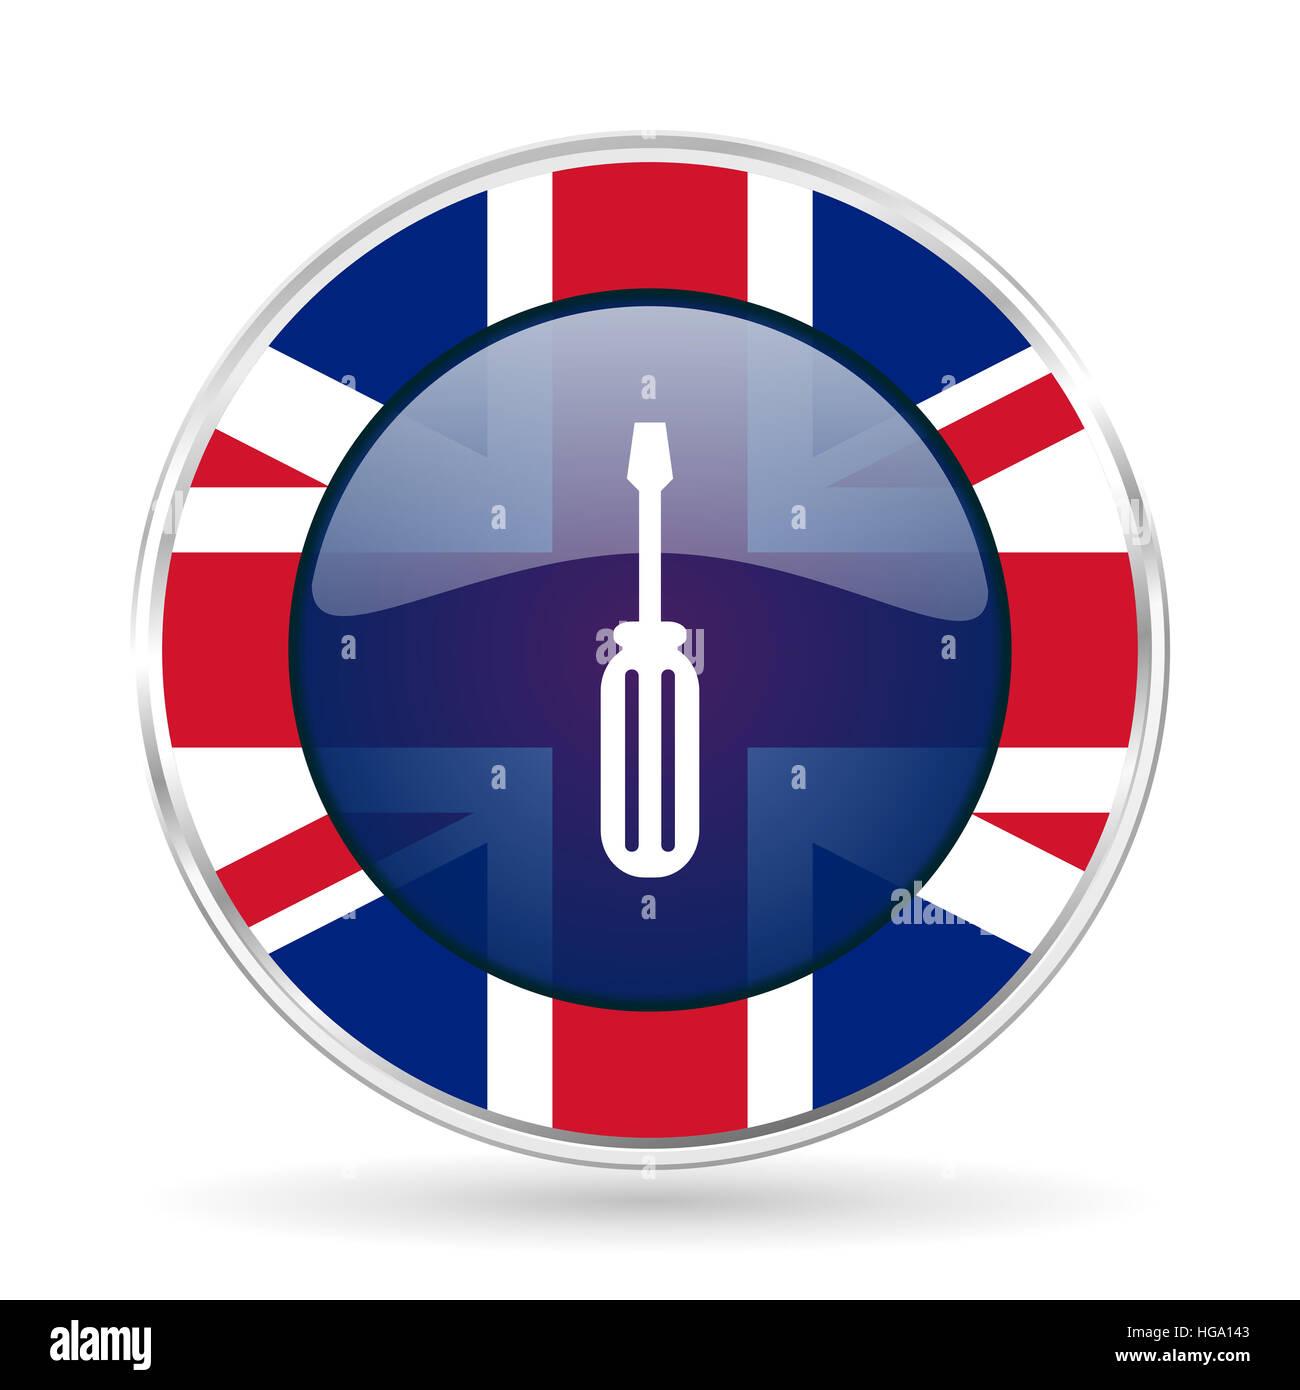 tool british design icon - round silver metallic border button with Great Britain flag - Stock Image